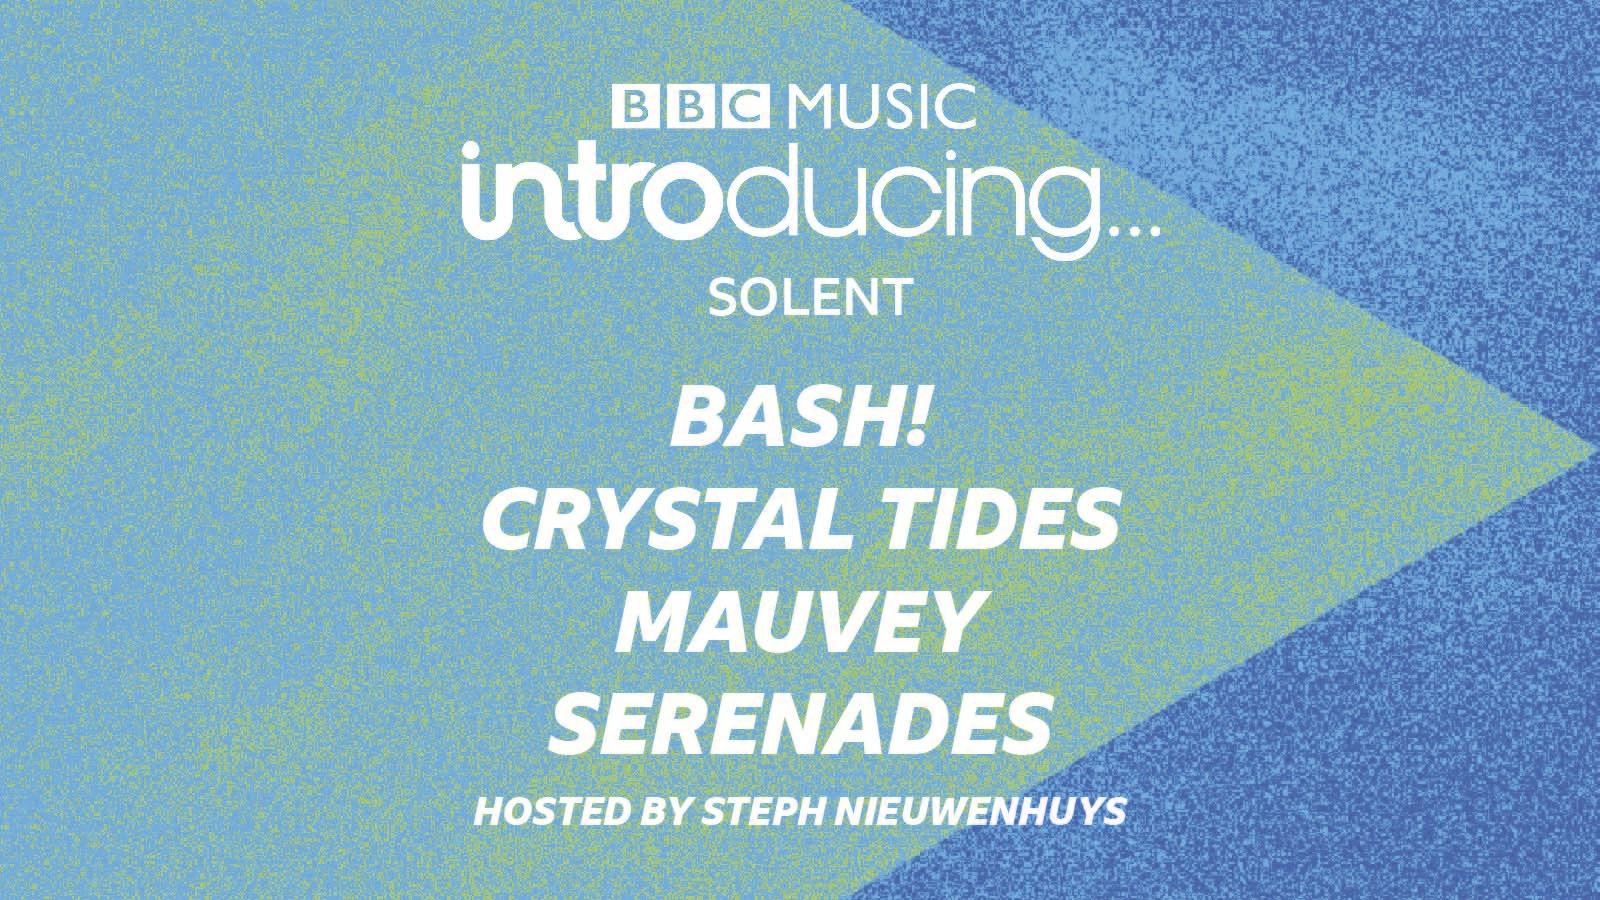 BBC Introducing Live in Southampton: BASH!, Crystal Tides, MAUVEY, Serenades